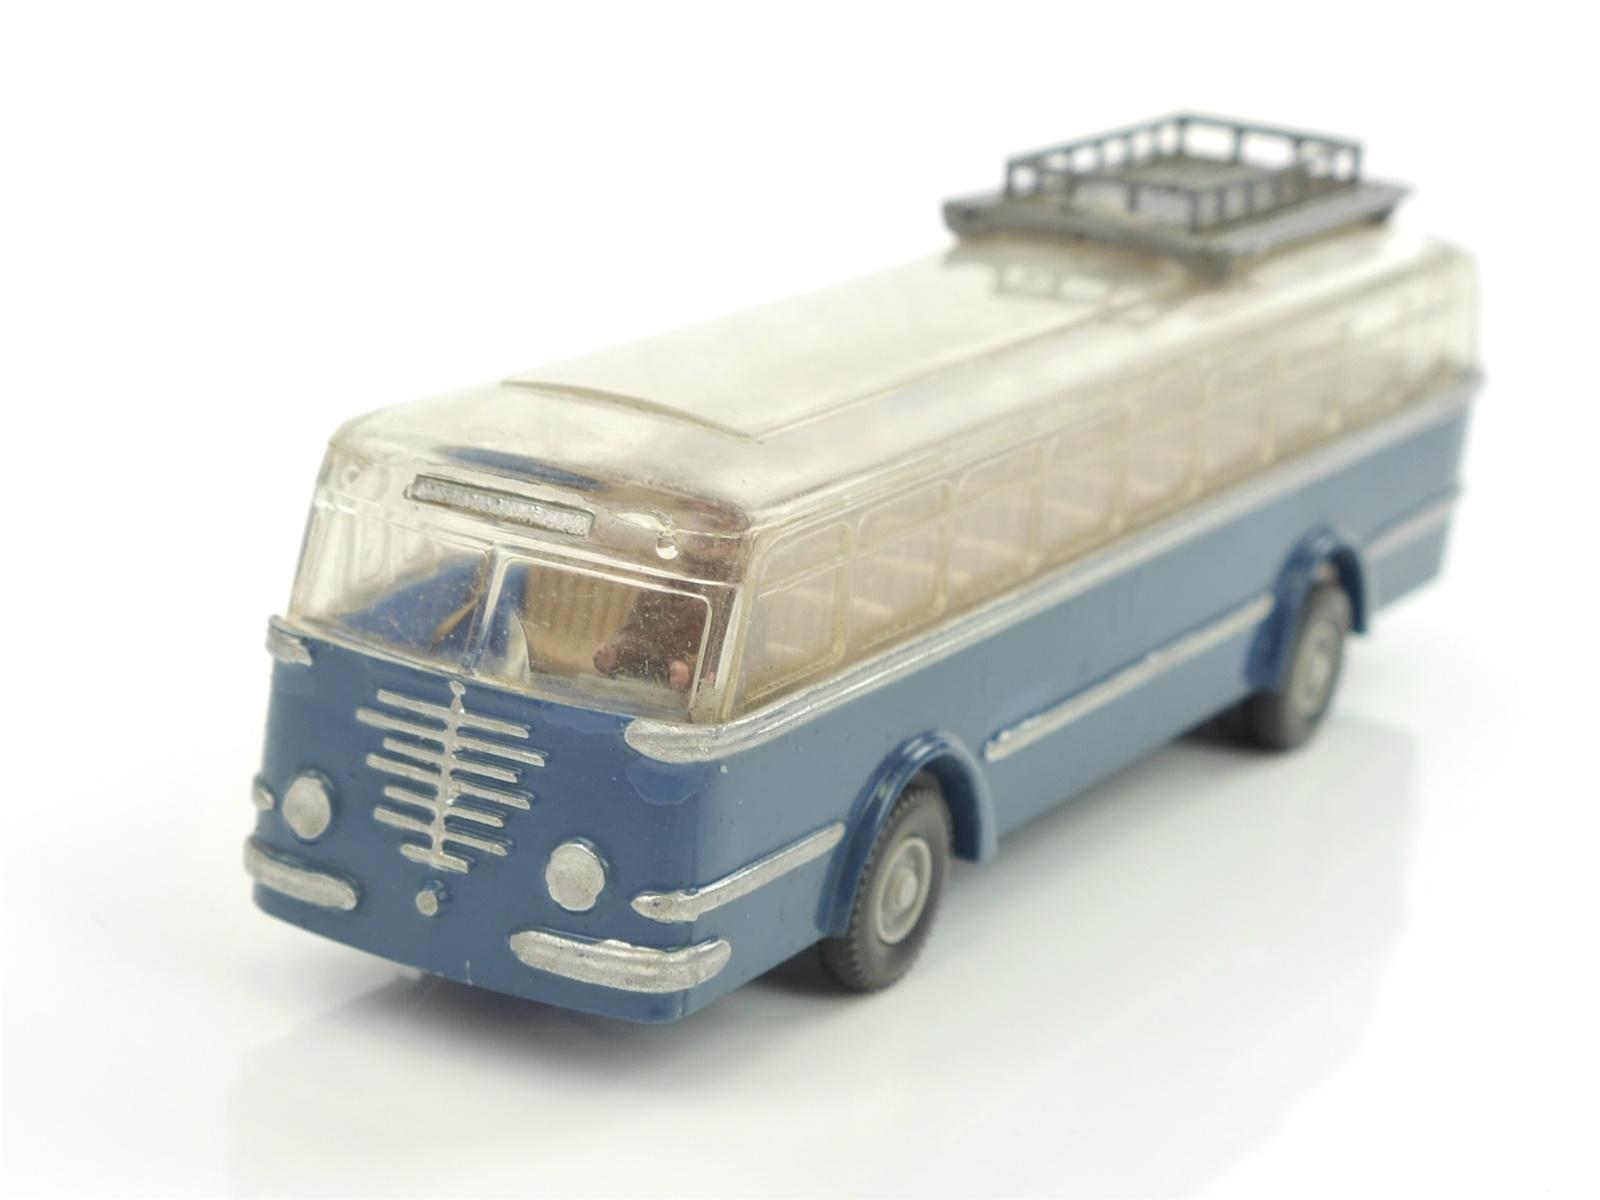 E47Z124s Wiking H0 1165/1C Büssing Tram-Bus ohne Dachlüfter himmelblau / WMiK